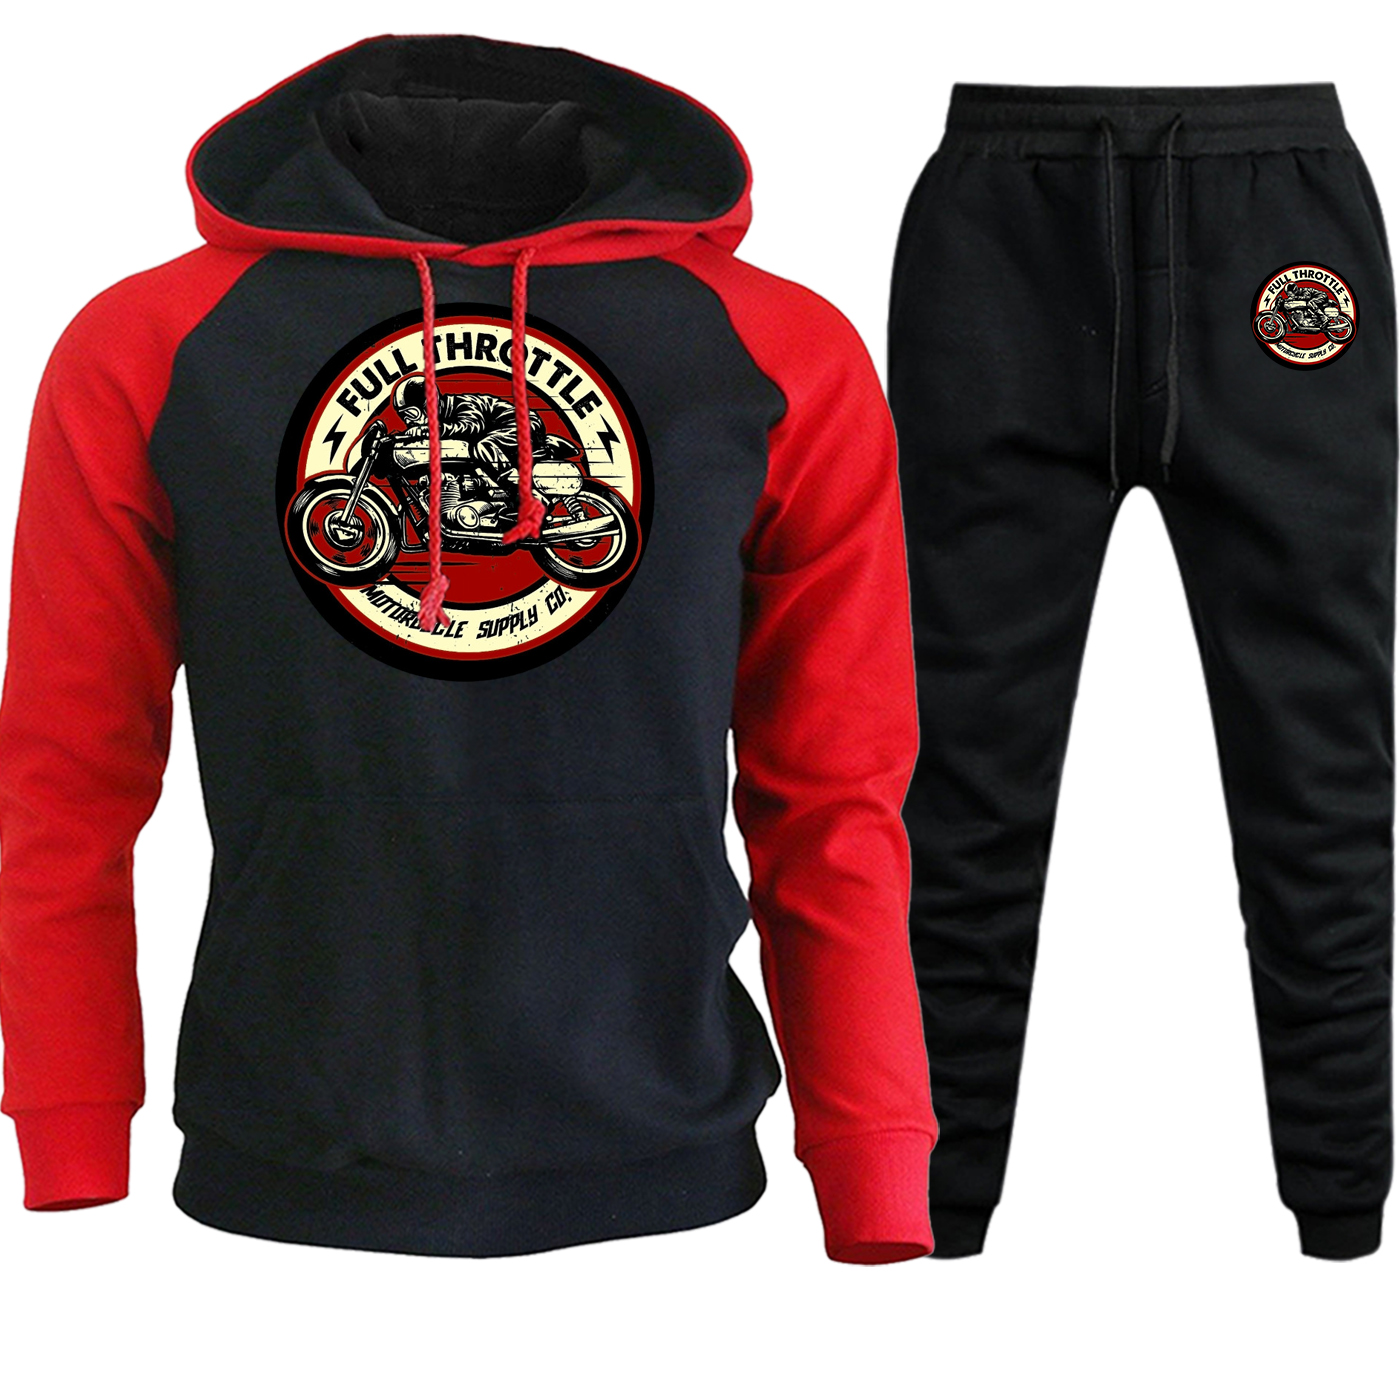 Hooded Men Raglan Sweatshirt Full Throttle Cafe Racer Rockabilly Biker New Autumn Winter Fleece Suit Pullover+Pants 2 Piece Set